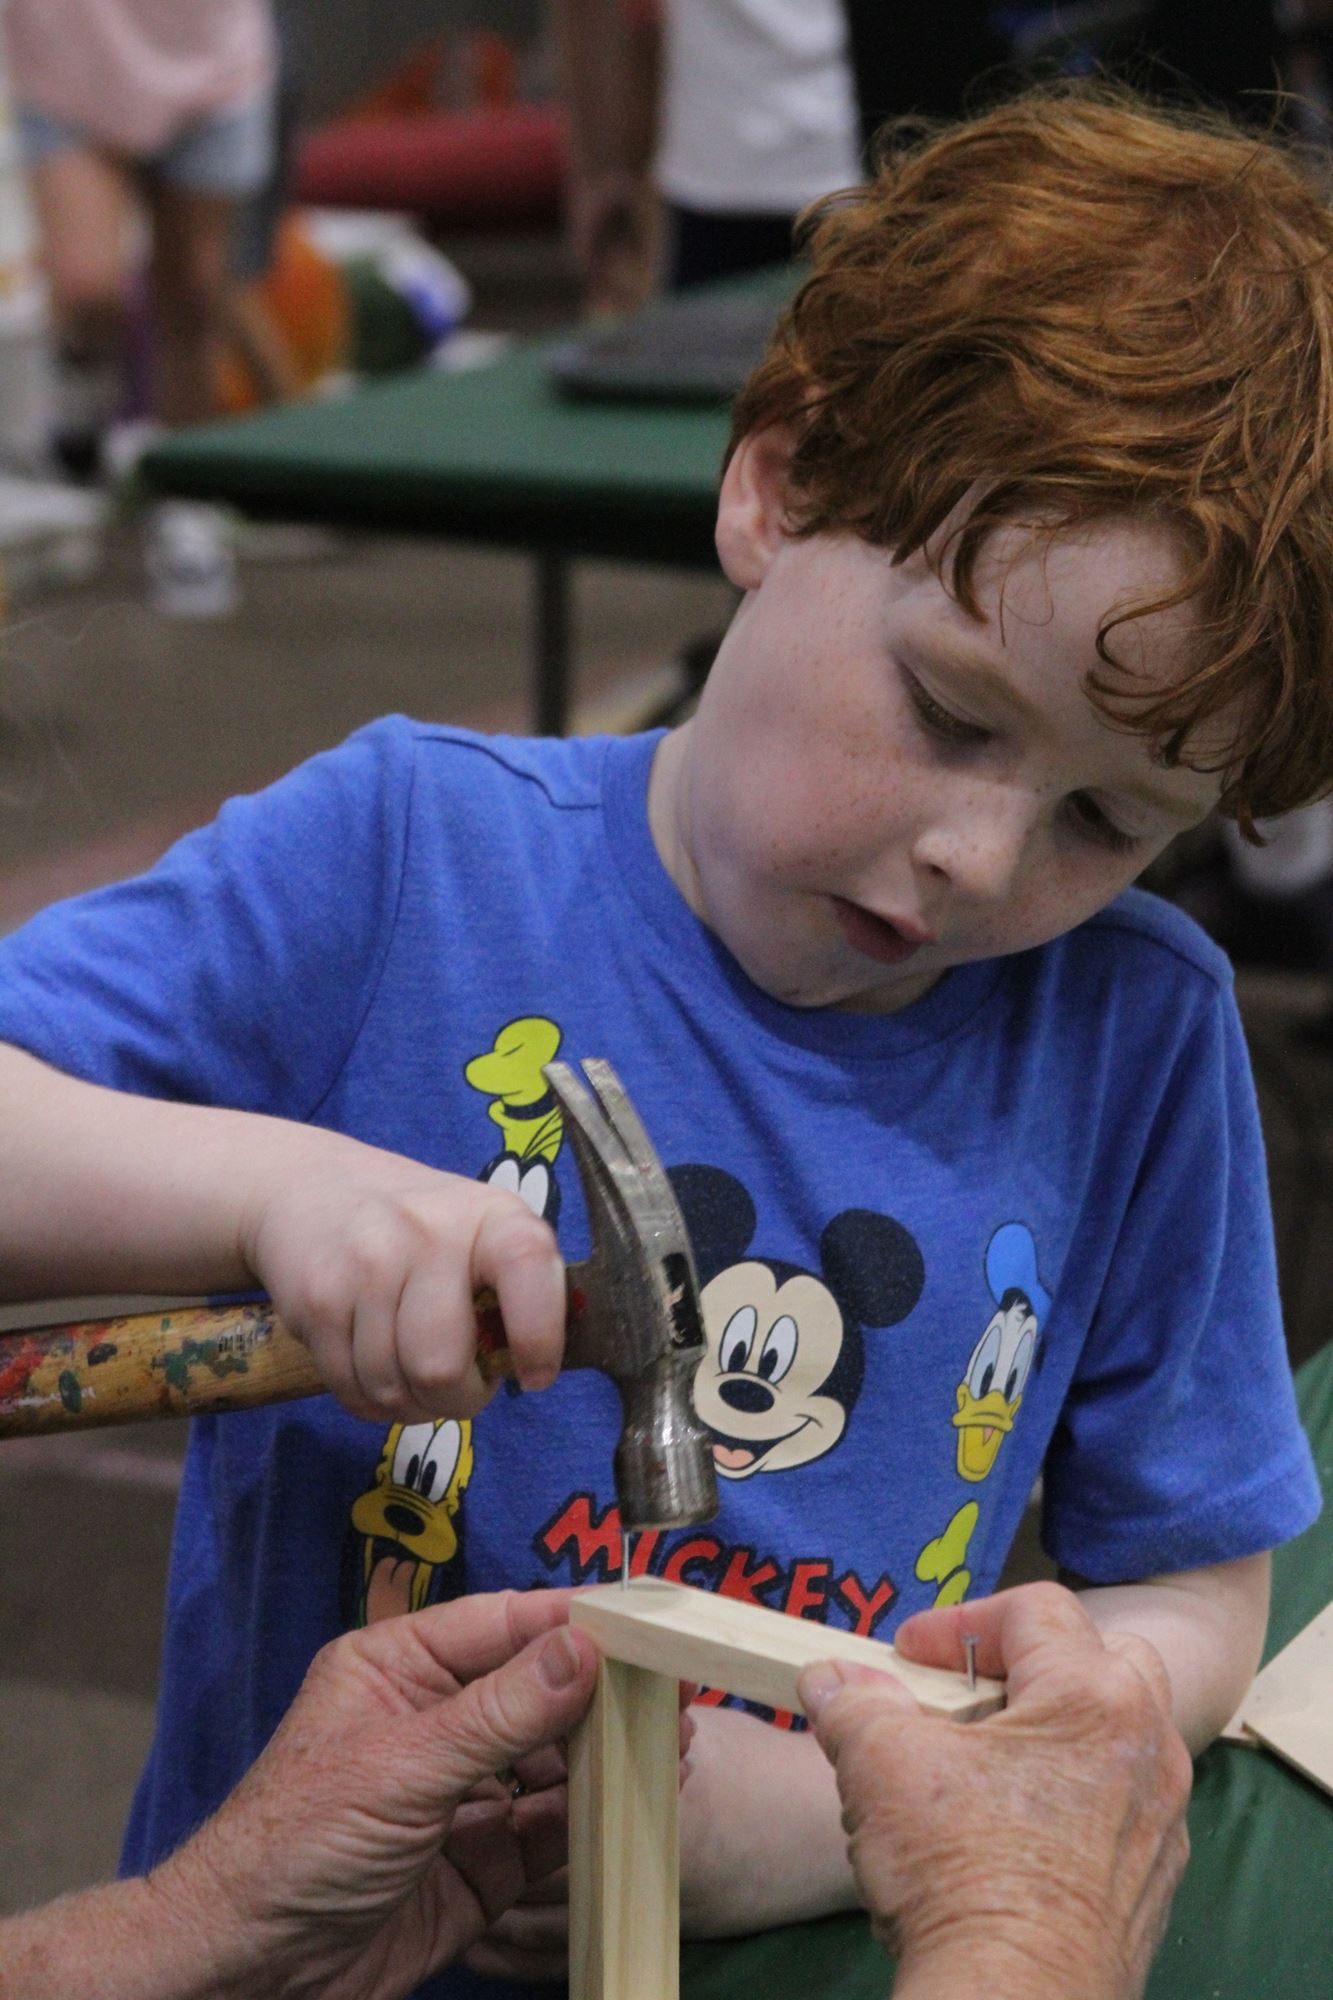 A little boy hammering wood